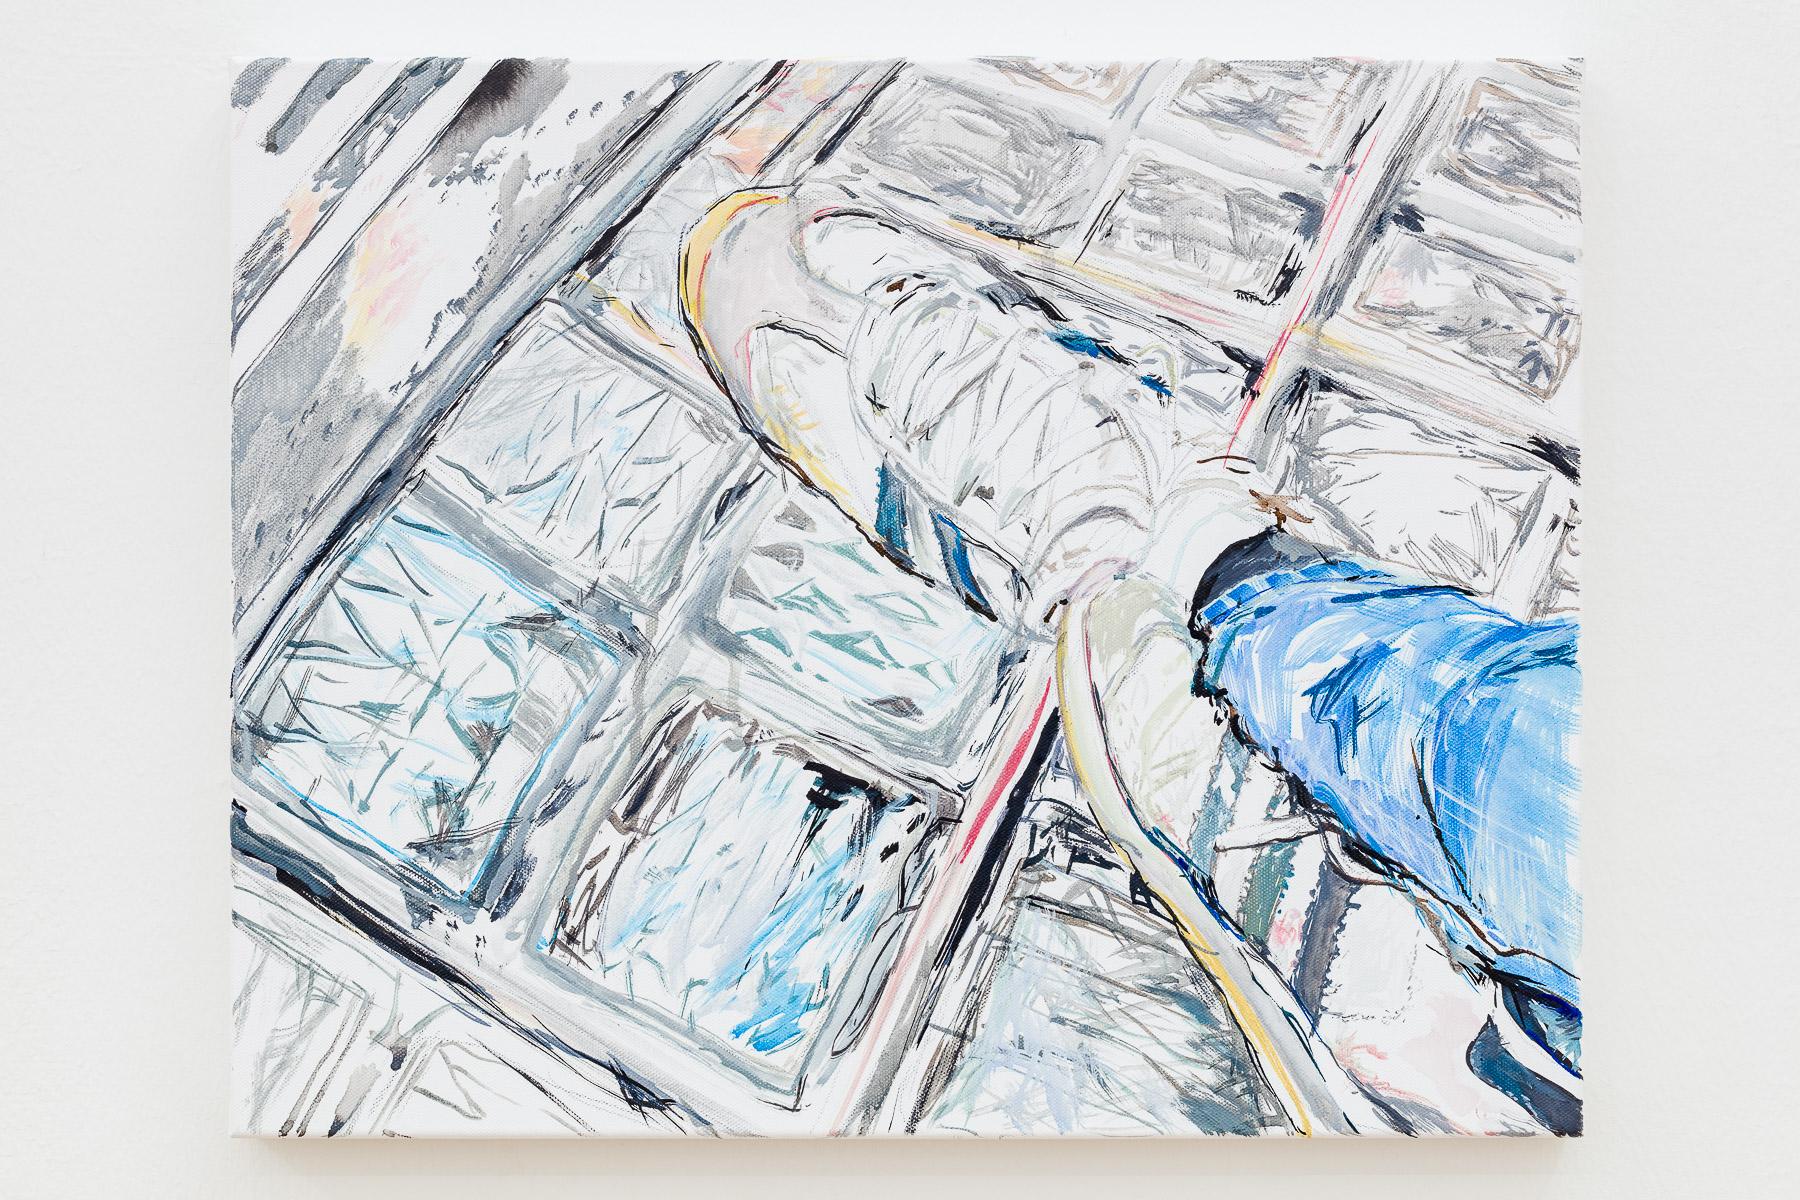 2019_05_20_Elke-Krystufek_Croy-Nielsen_by-kunst-dokumentation-com_025_web.jpg